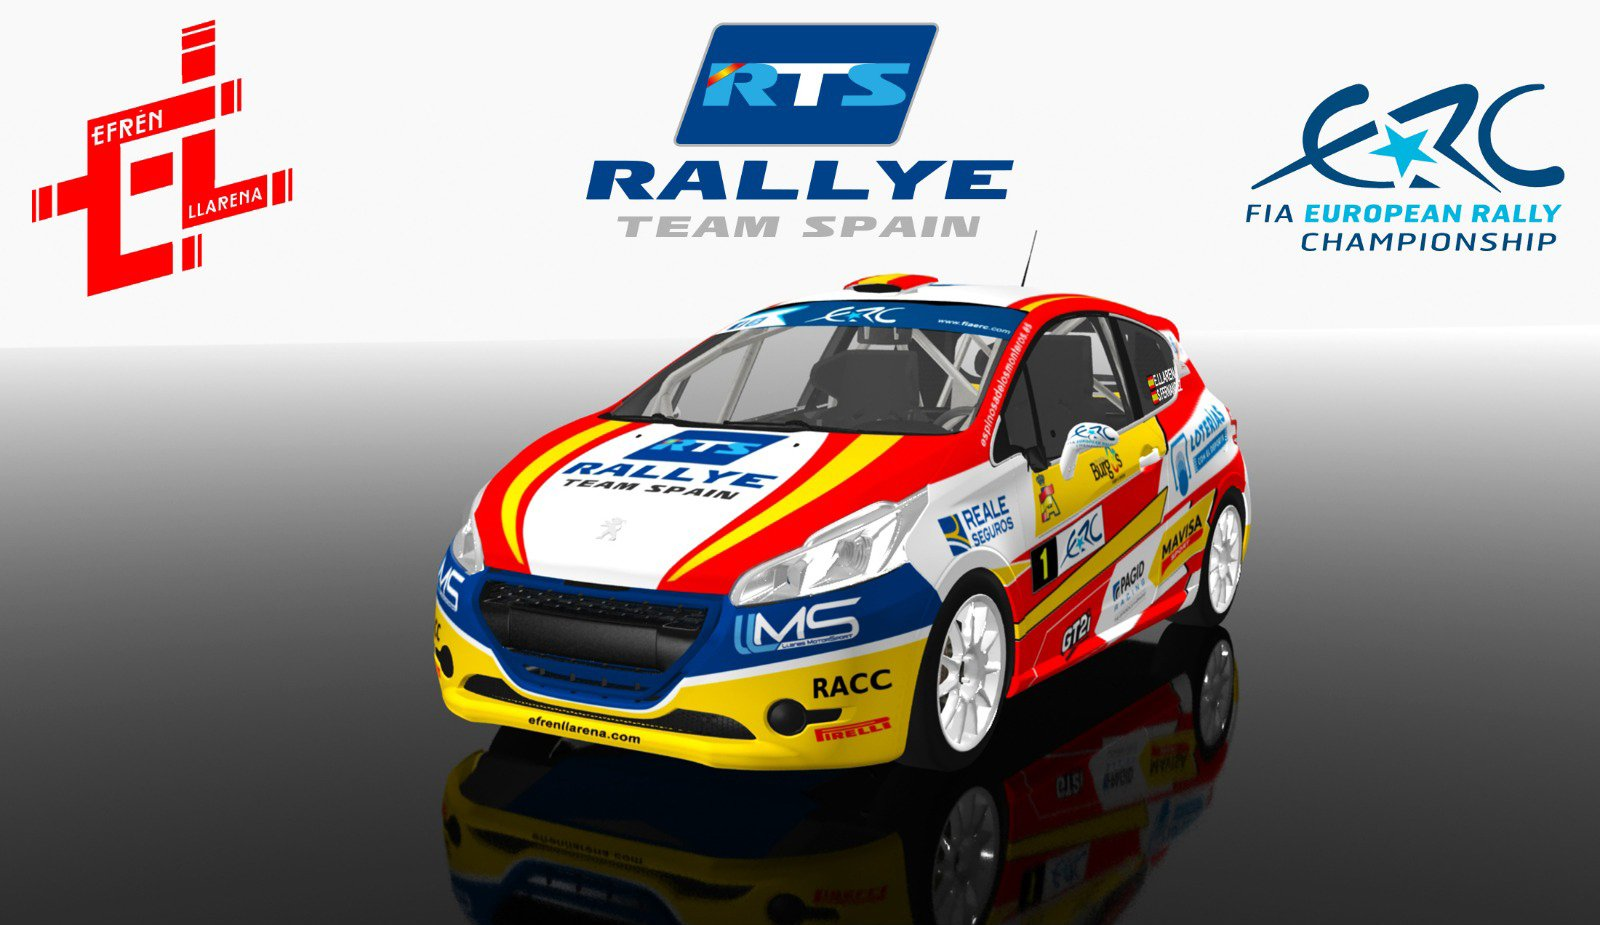 FIA European Rally Championship: Temporada 2019 - Página 3 D19yfpvW0AAneJF